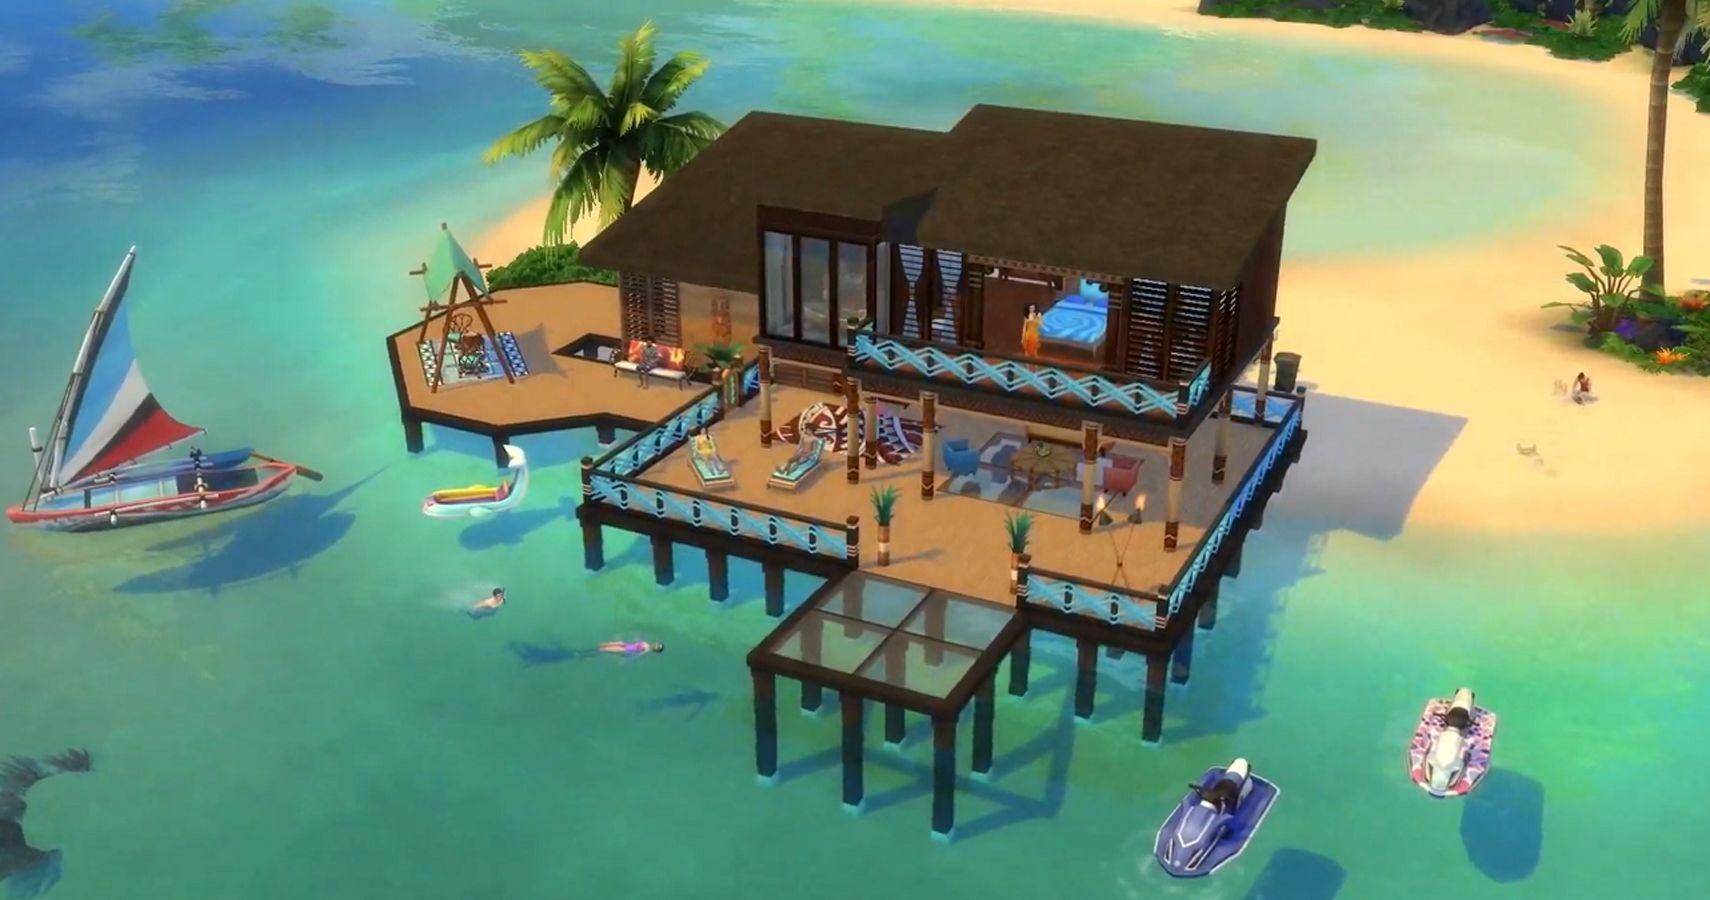 Sims 4 Npc Stuck On Lot